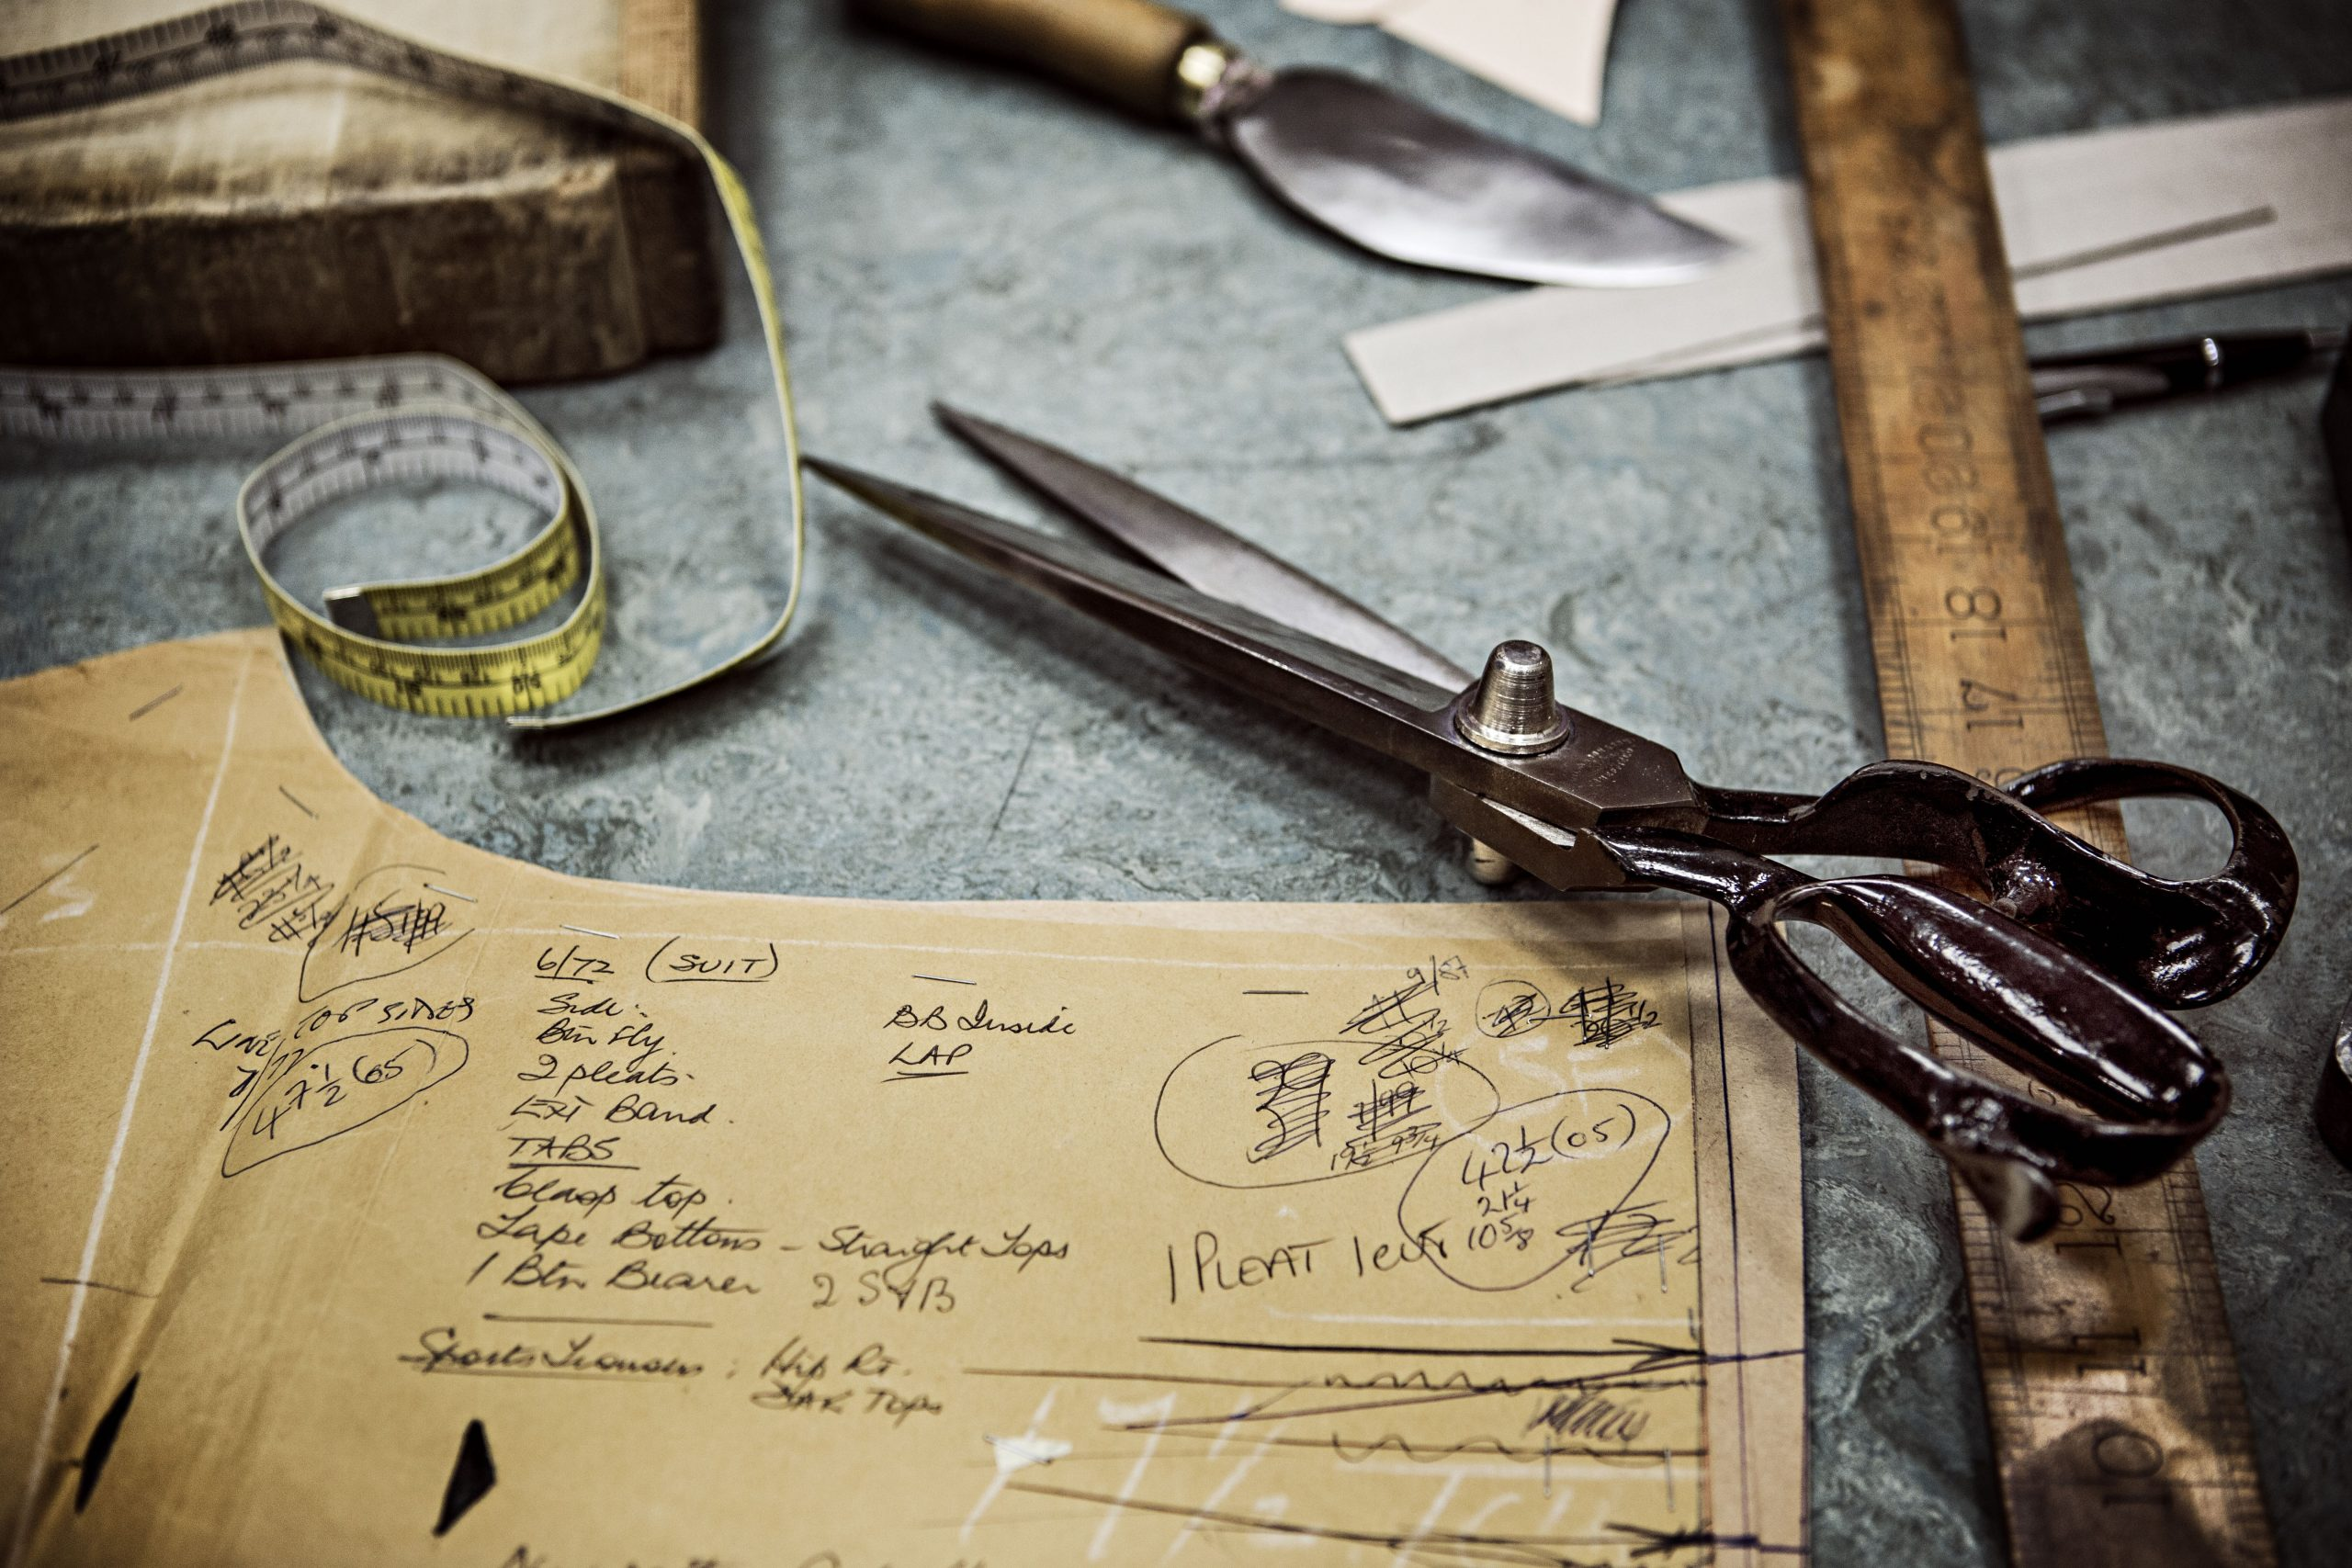 Insiders Guide to London Craft Week